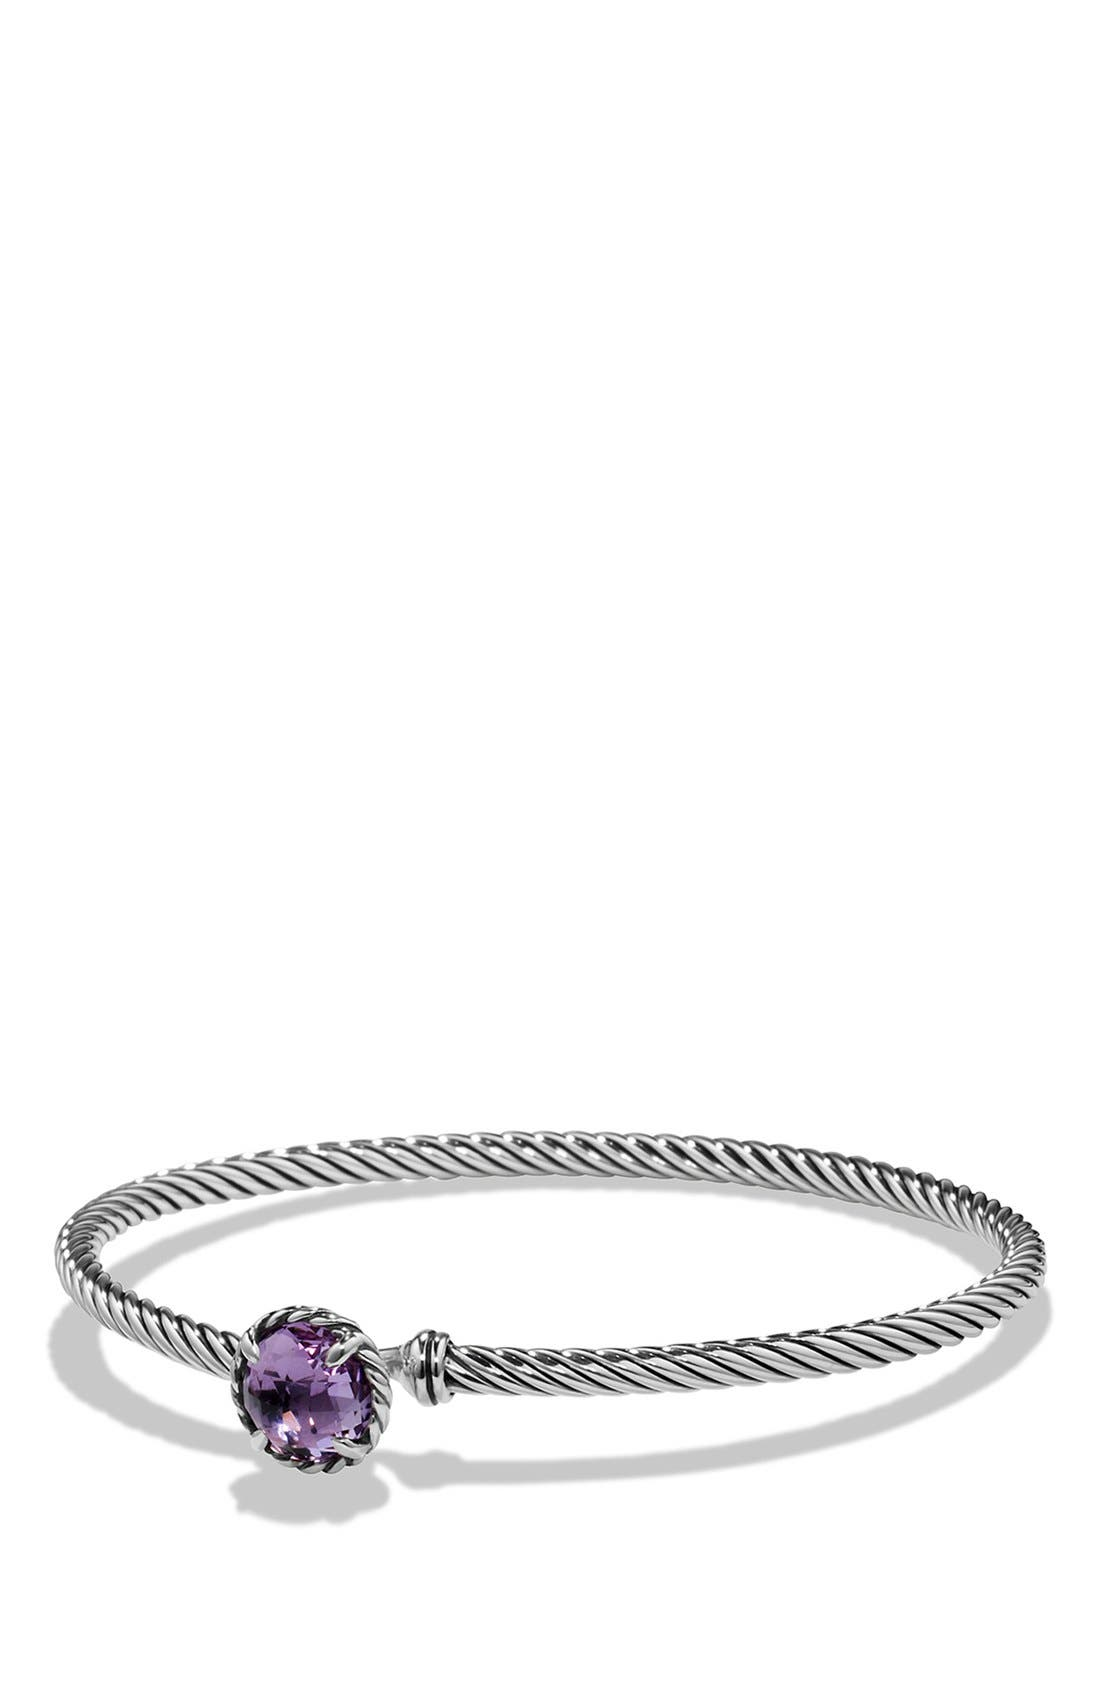 DAVID YURMAN, 'Color Classics' Bangle Bracelet, Main thumbnail 1, color, AMETHYST